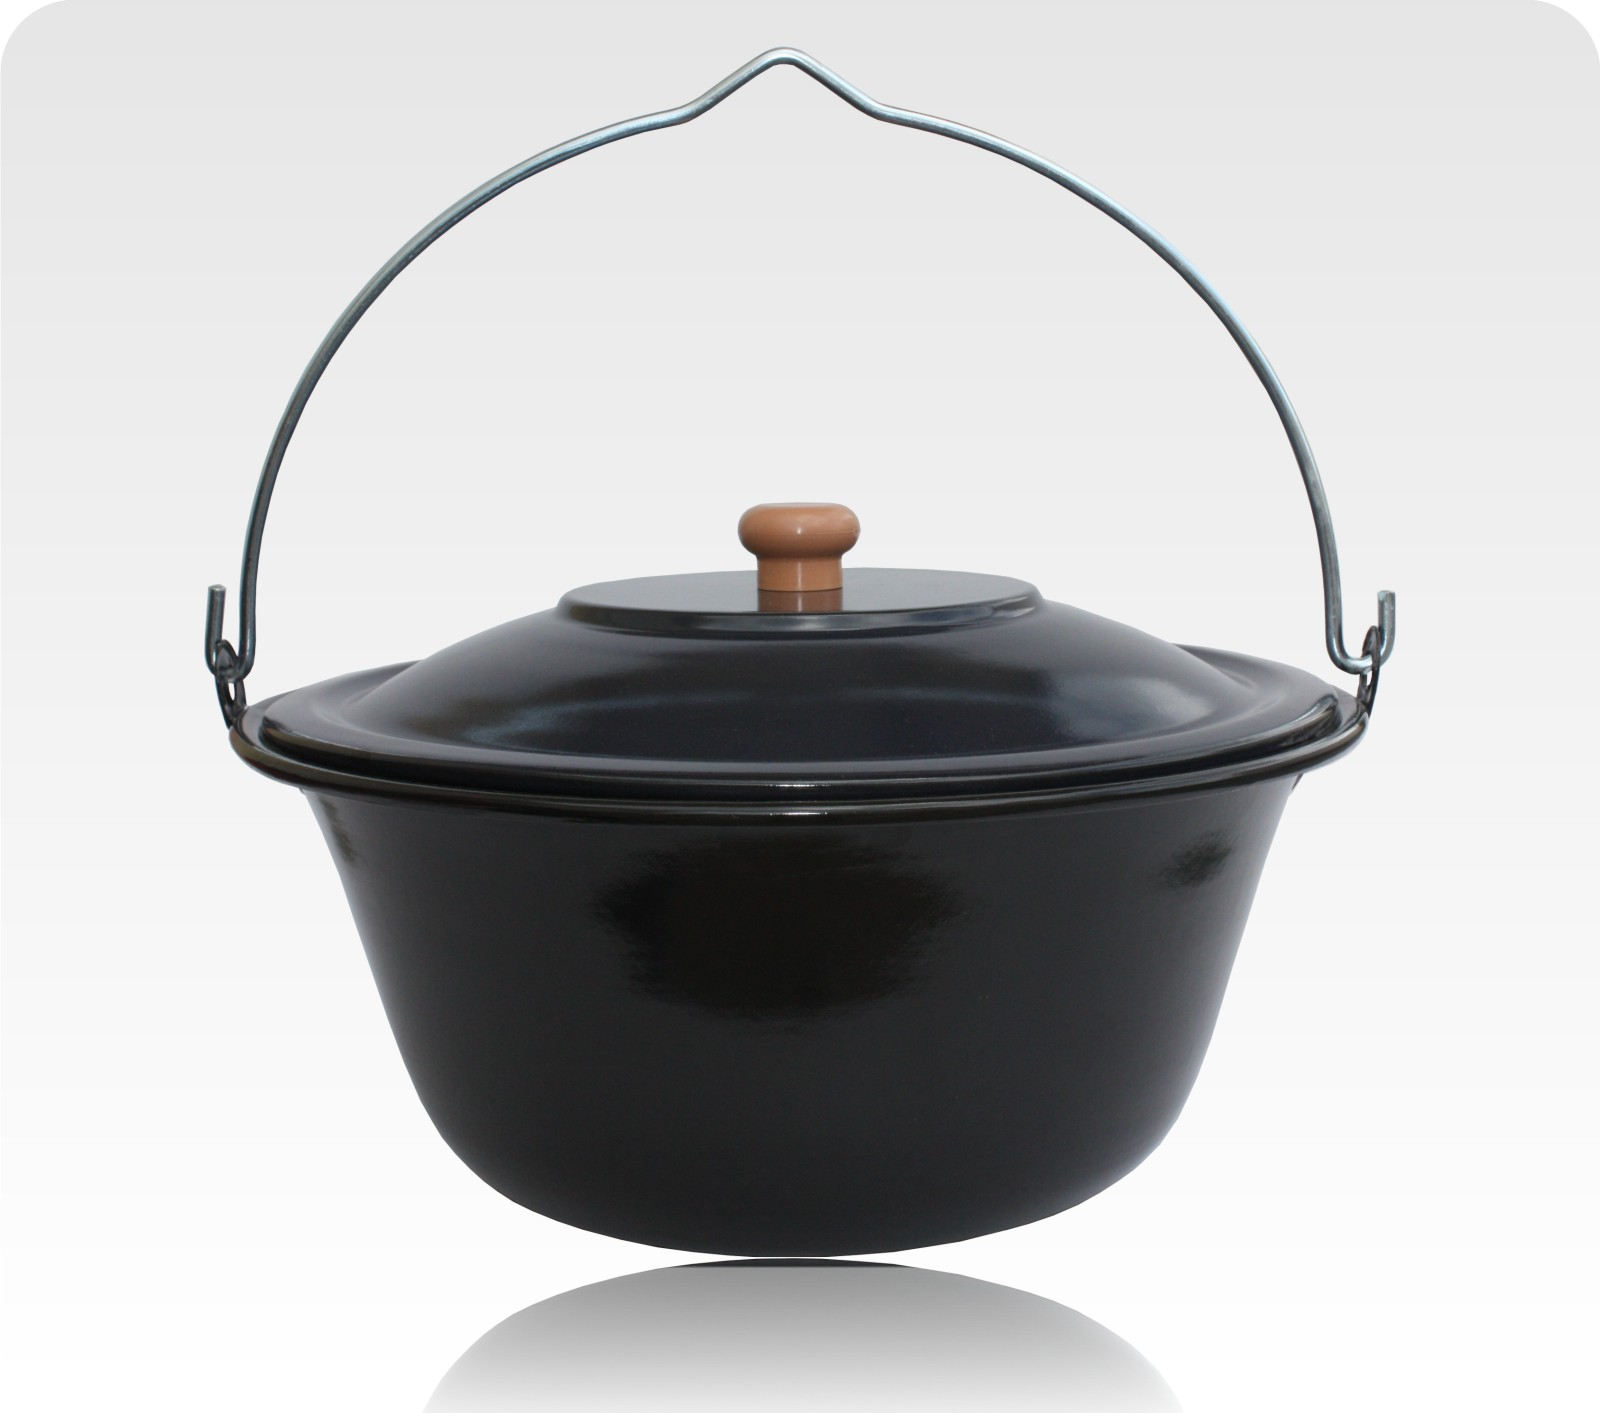 16l gulaschkessel emailliert deckel holzl ffel 5 rezepte 16 liter bogracs ebay. Black Bedroom Furniture Sets. Home Design Ideas